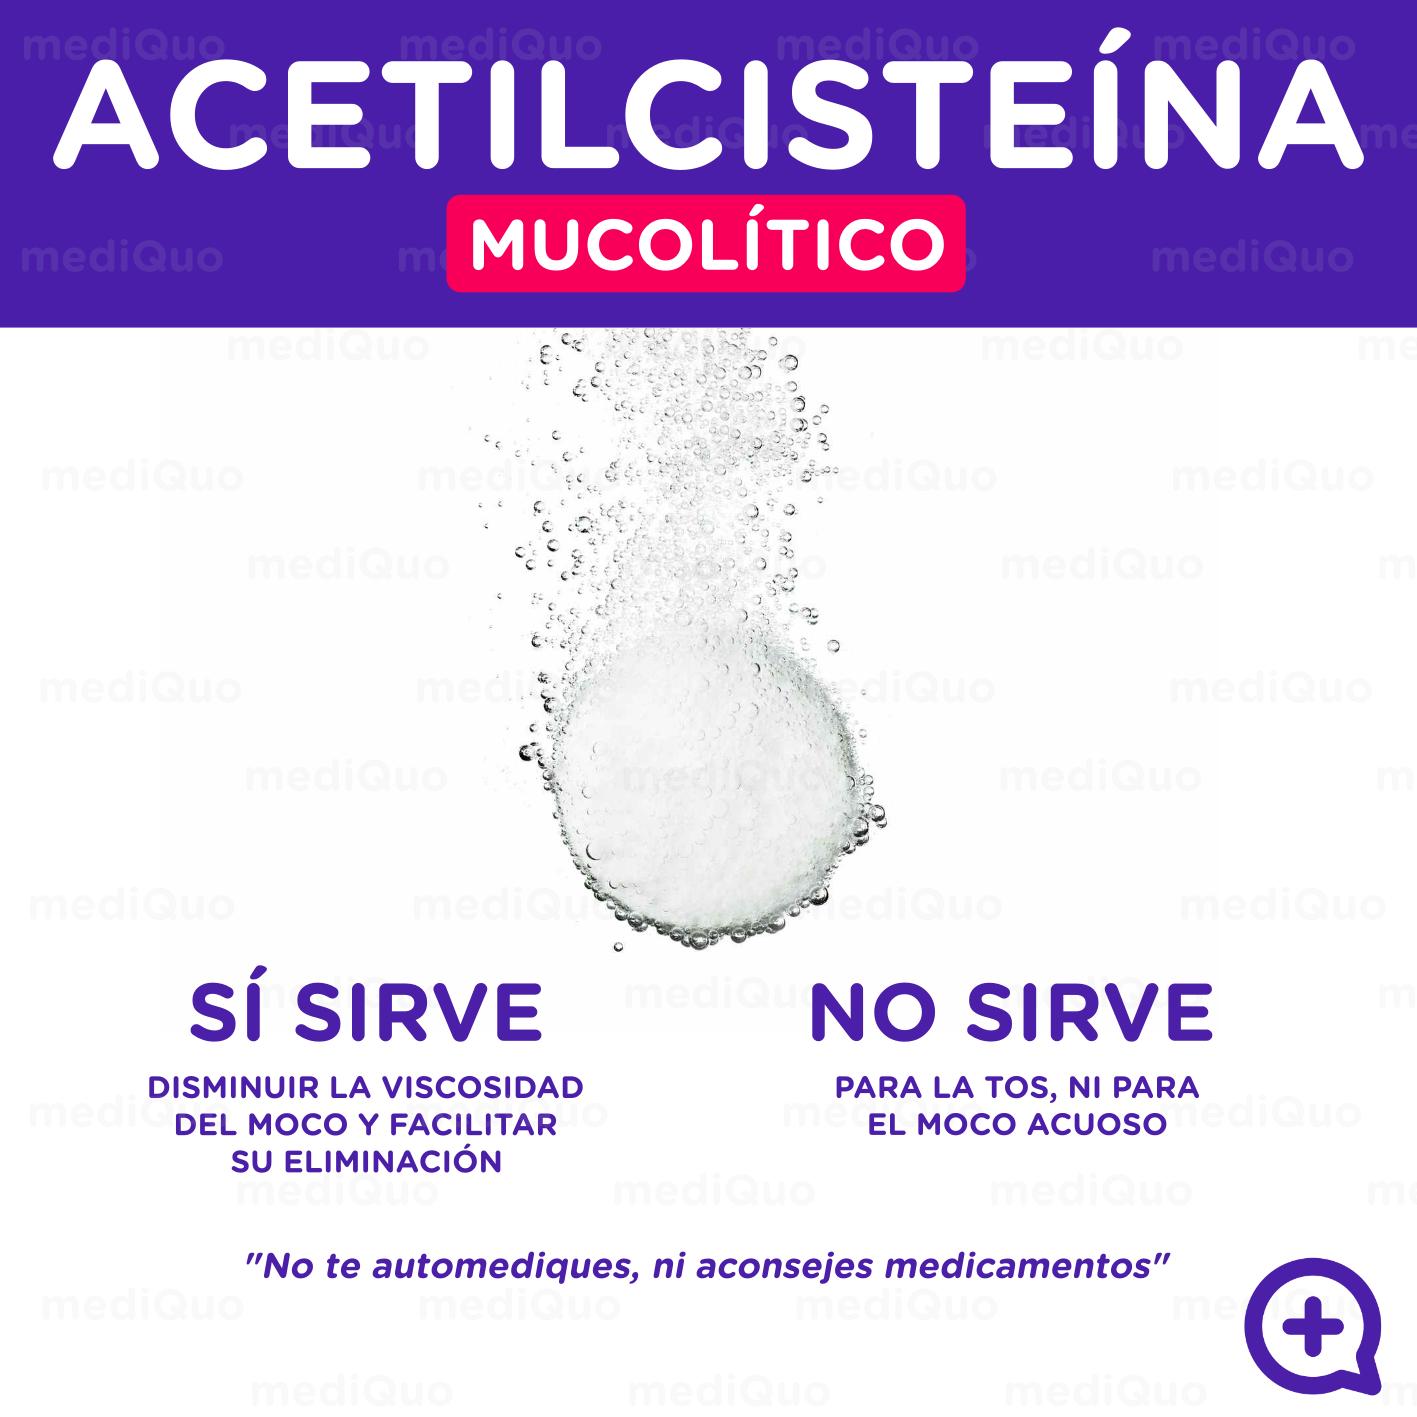 Infografías_ACETILCISTEÍNA_mediquo